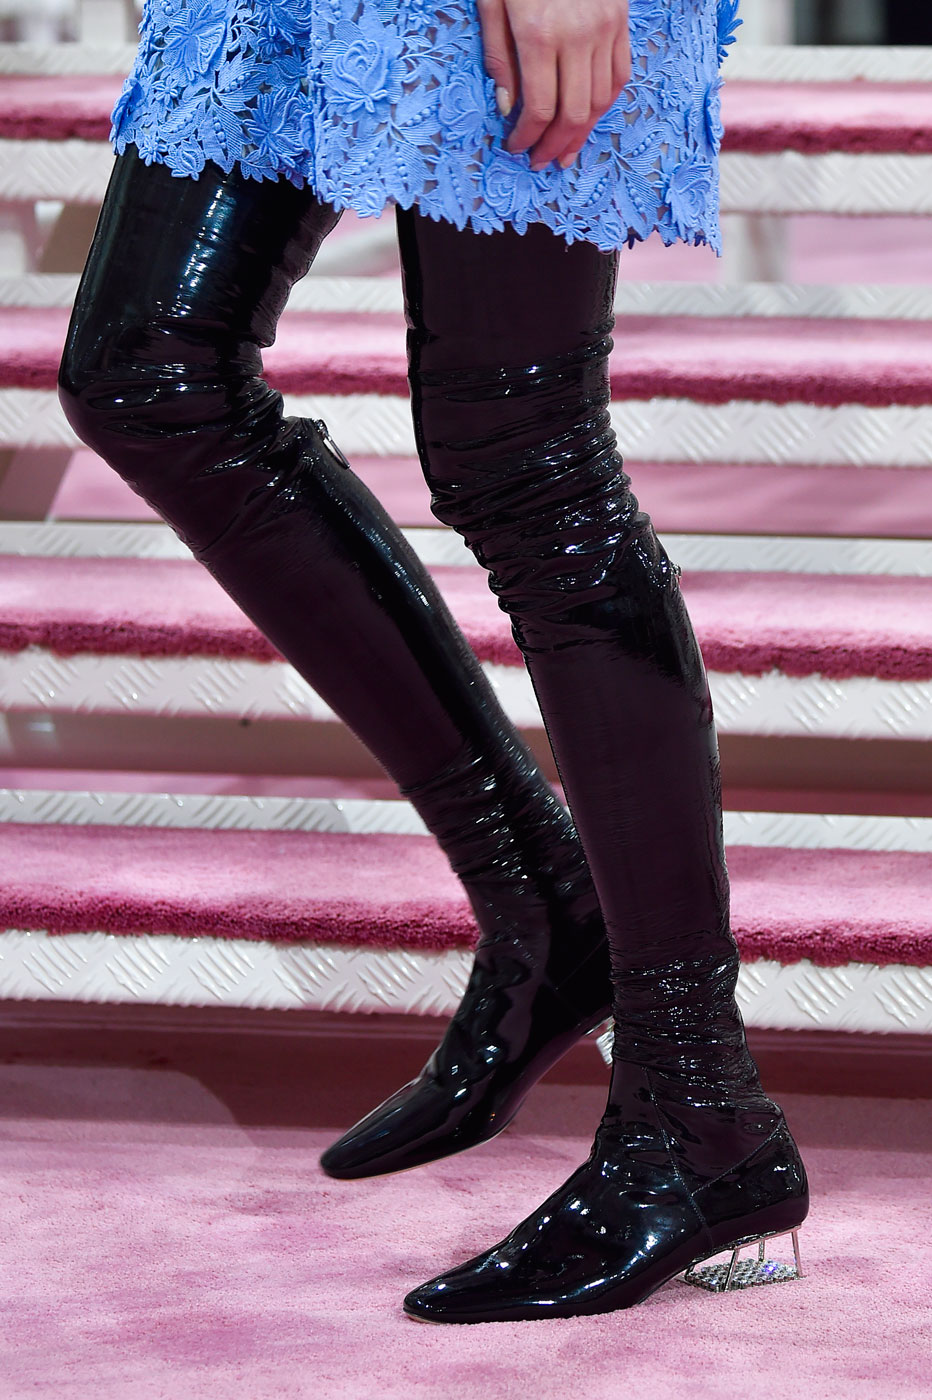 Christian-Dior-fashion-runway-show-close-ups-haute-couture-paris-spring-summer-2015-the-impression-068